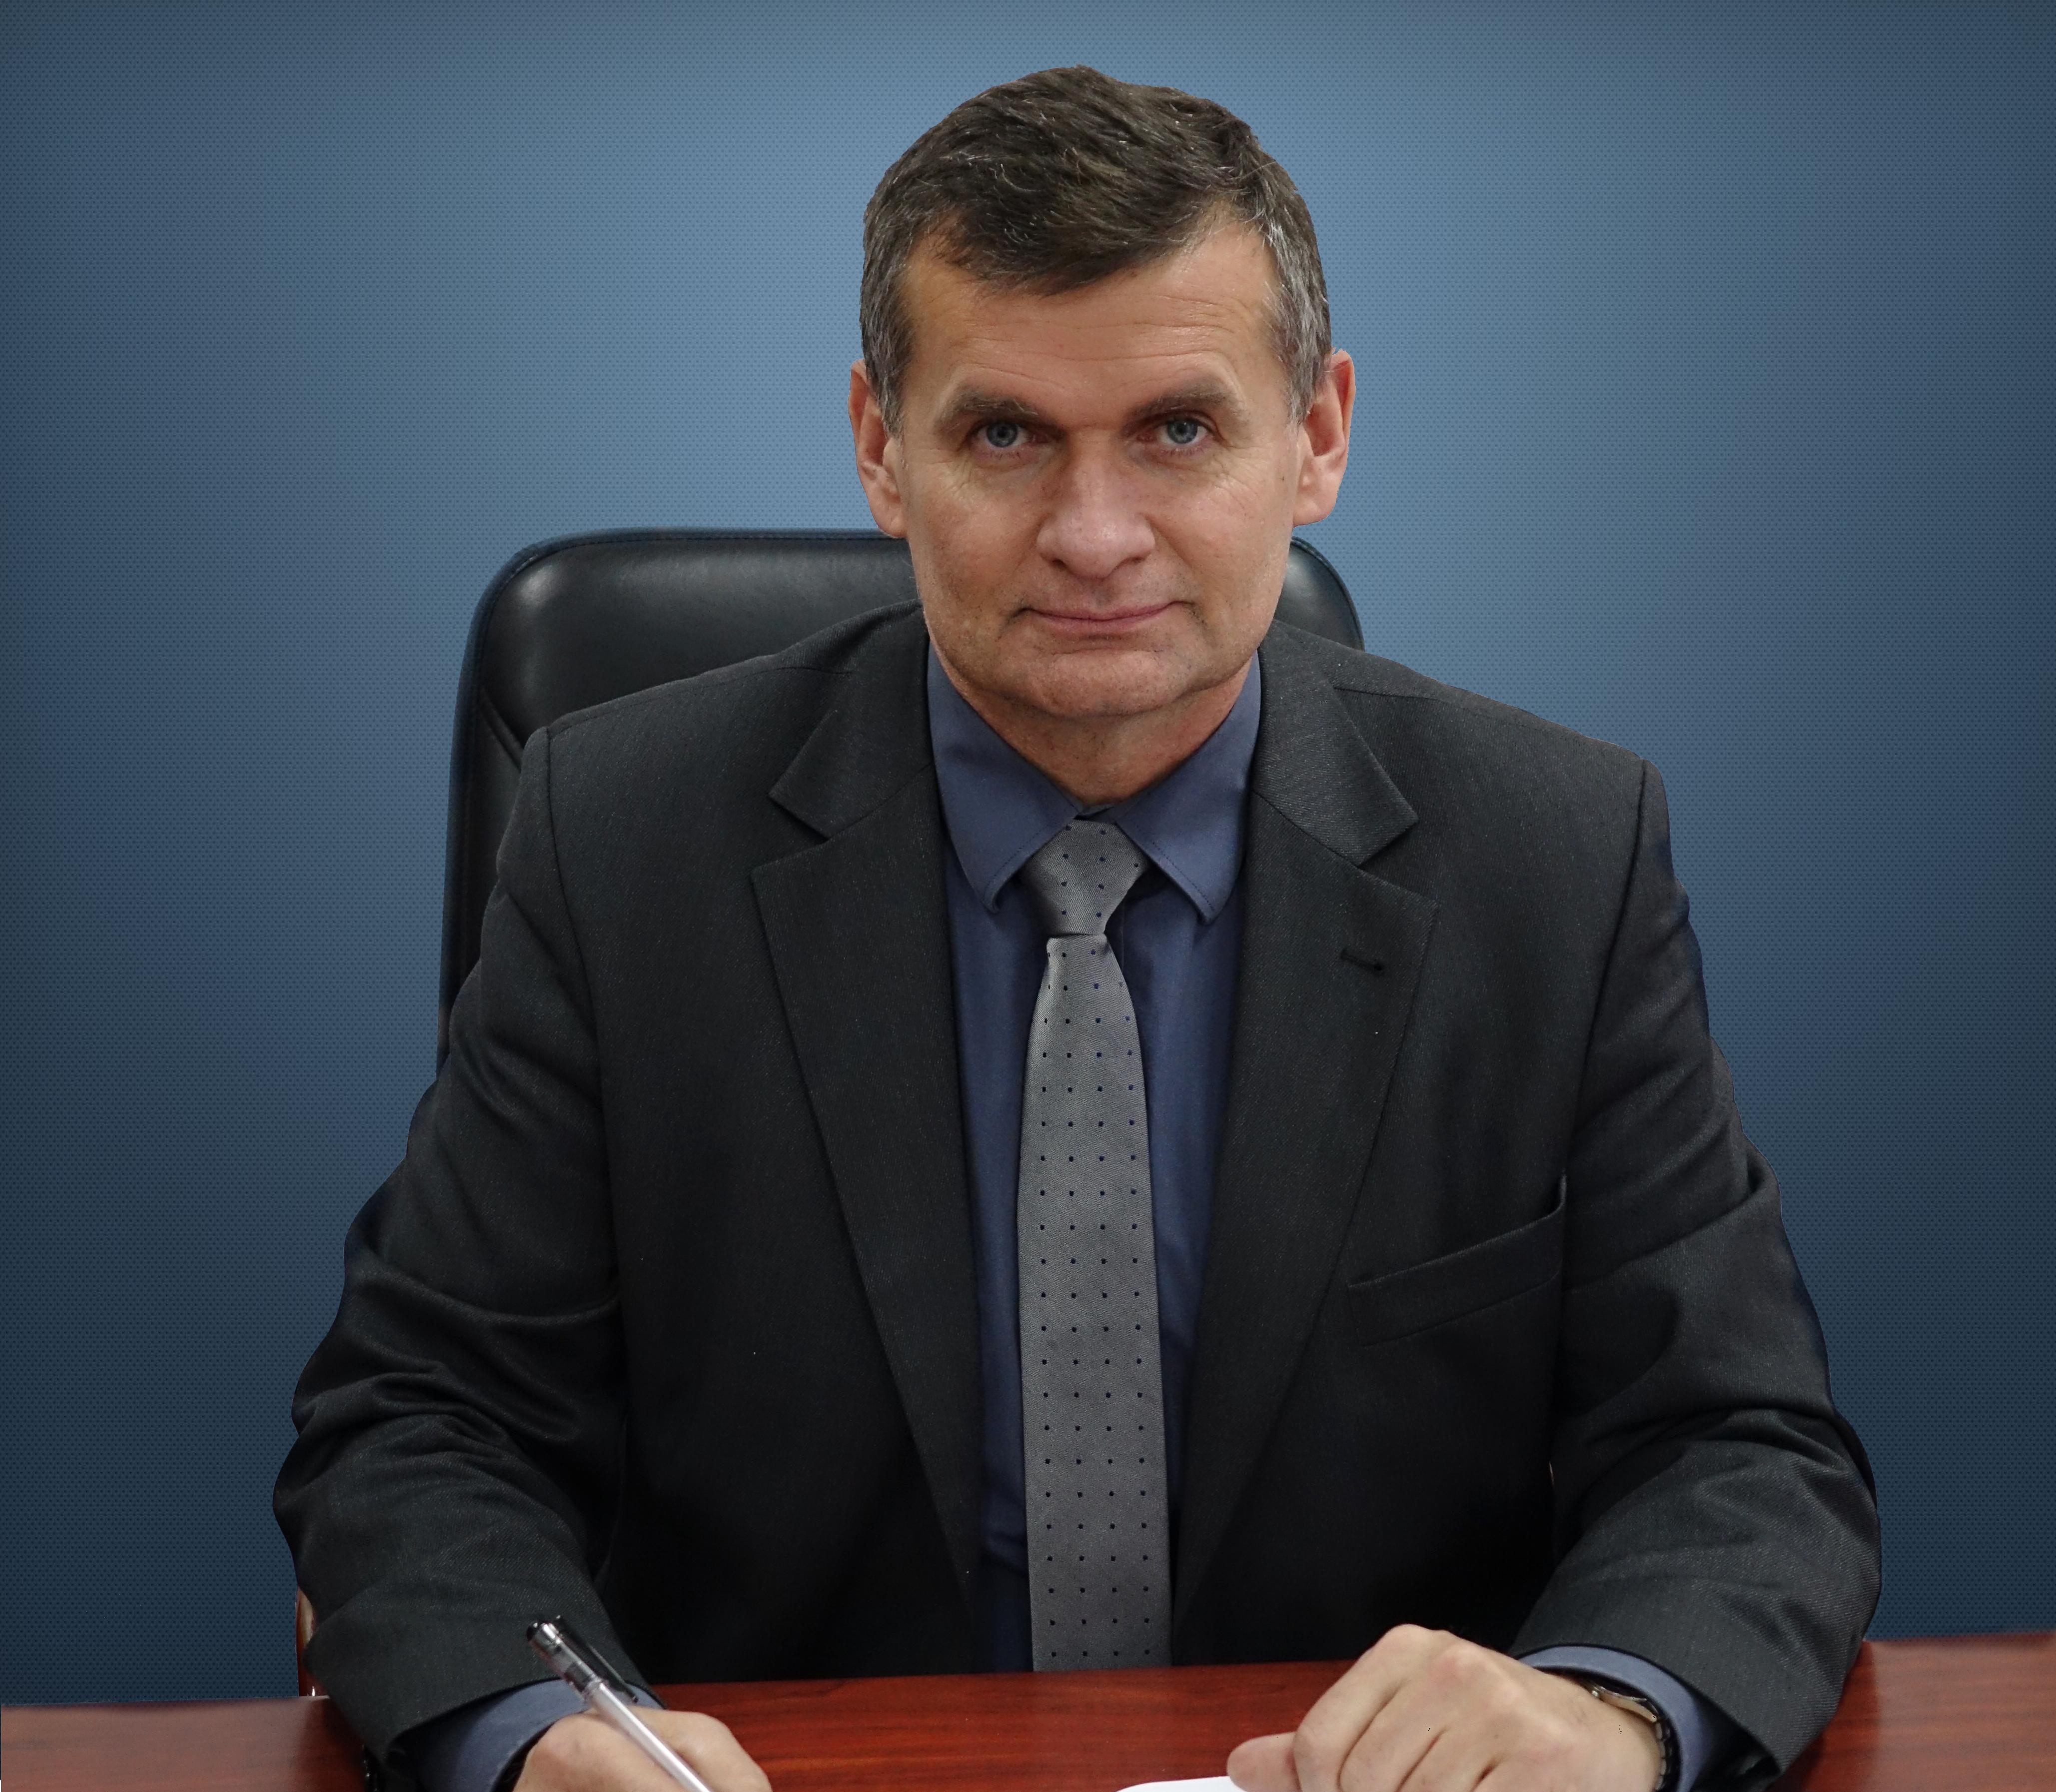 mgr Janusz Bernard Reszelewski